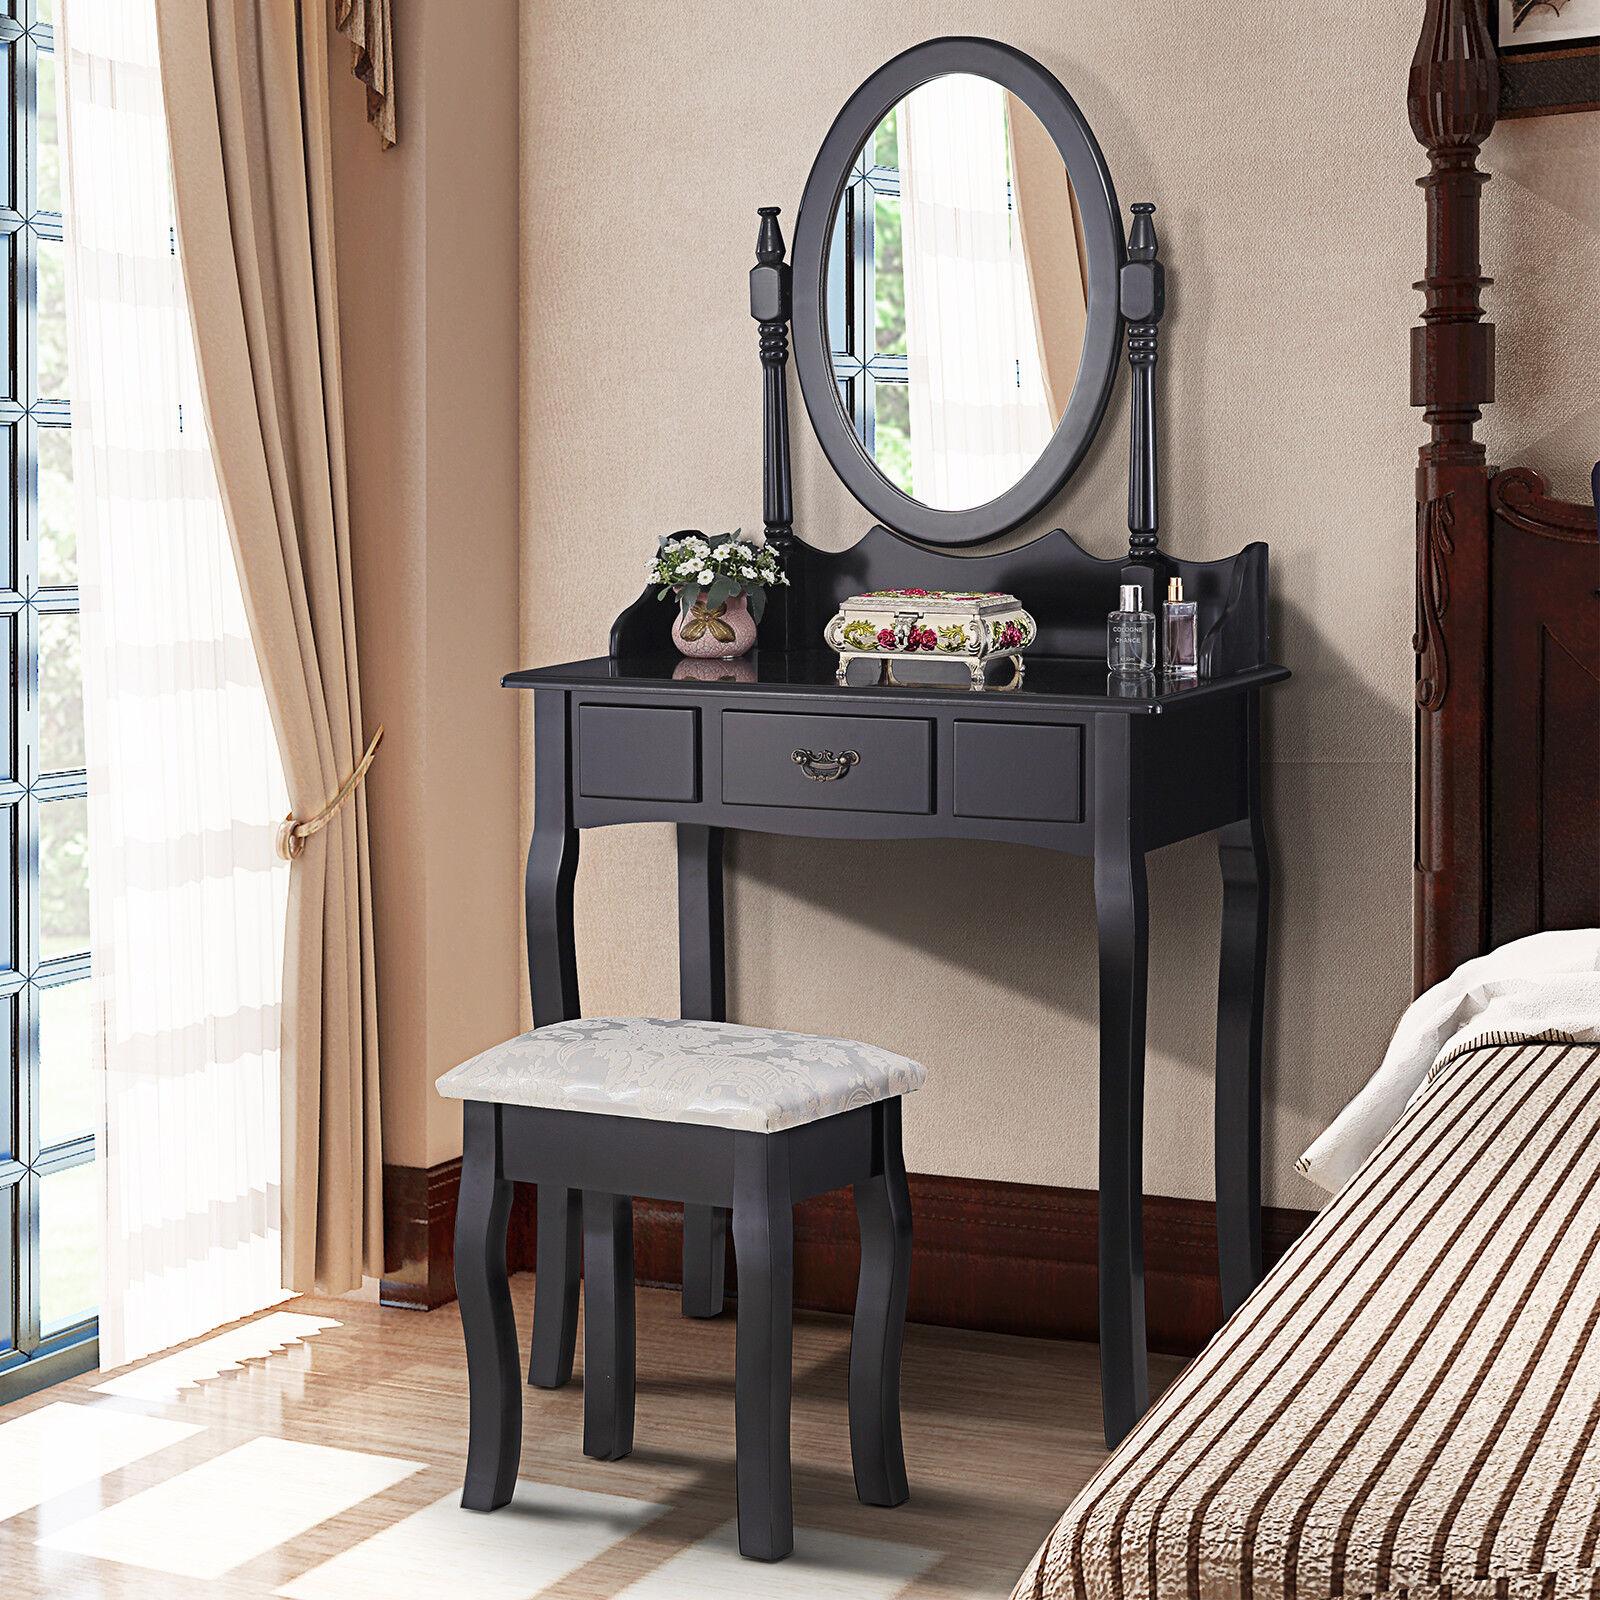 Details about Black Dressing Table Makeup Desk w/ Stool,Round Mirror,Drawer  Bedroom Furniture